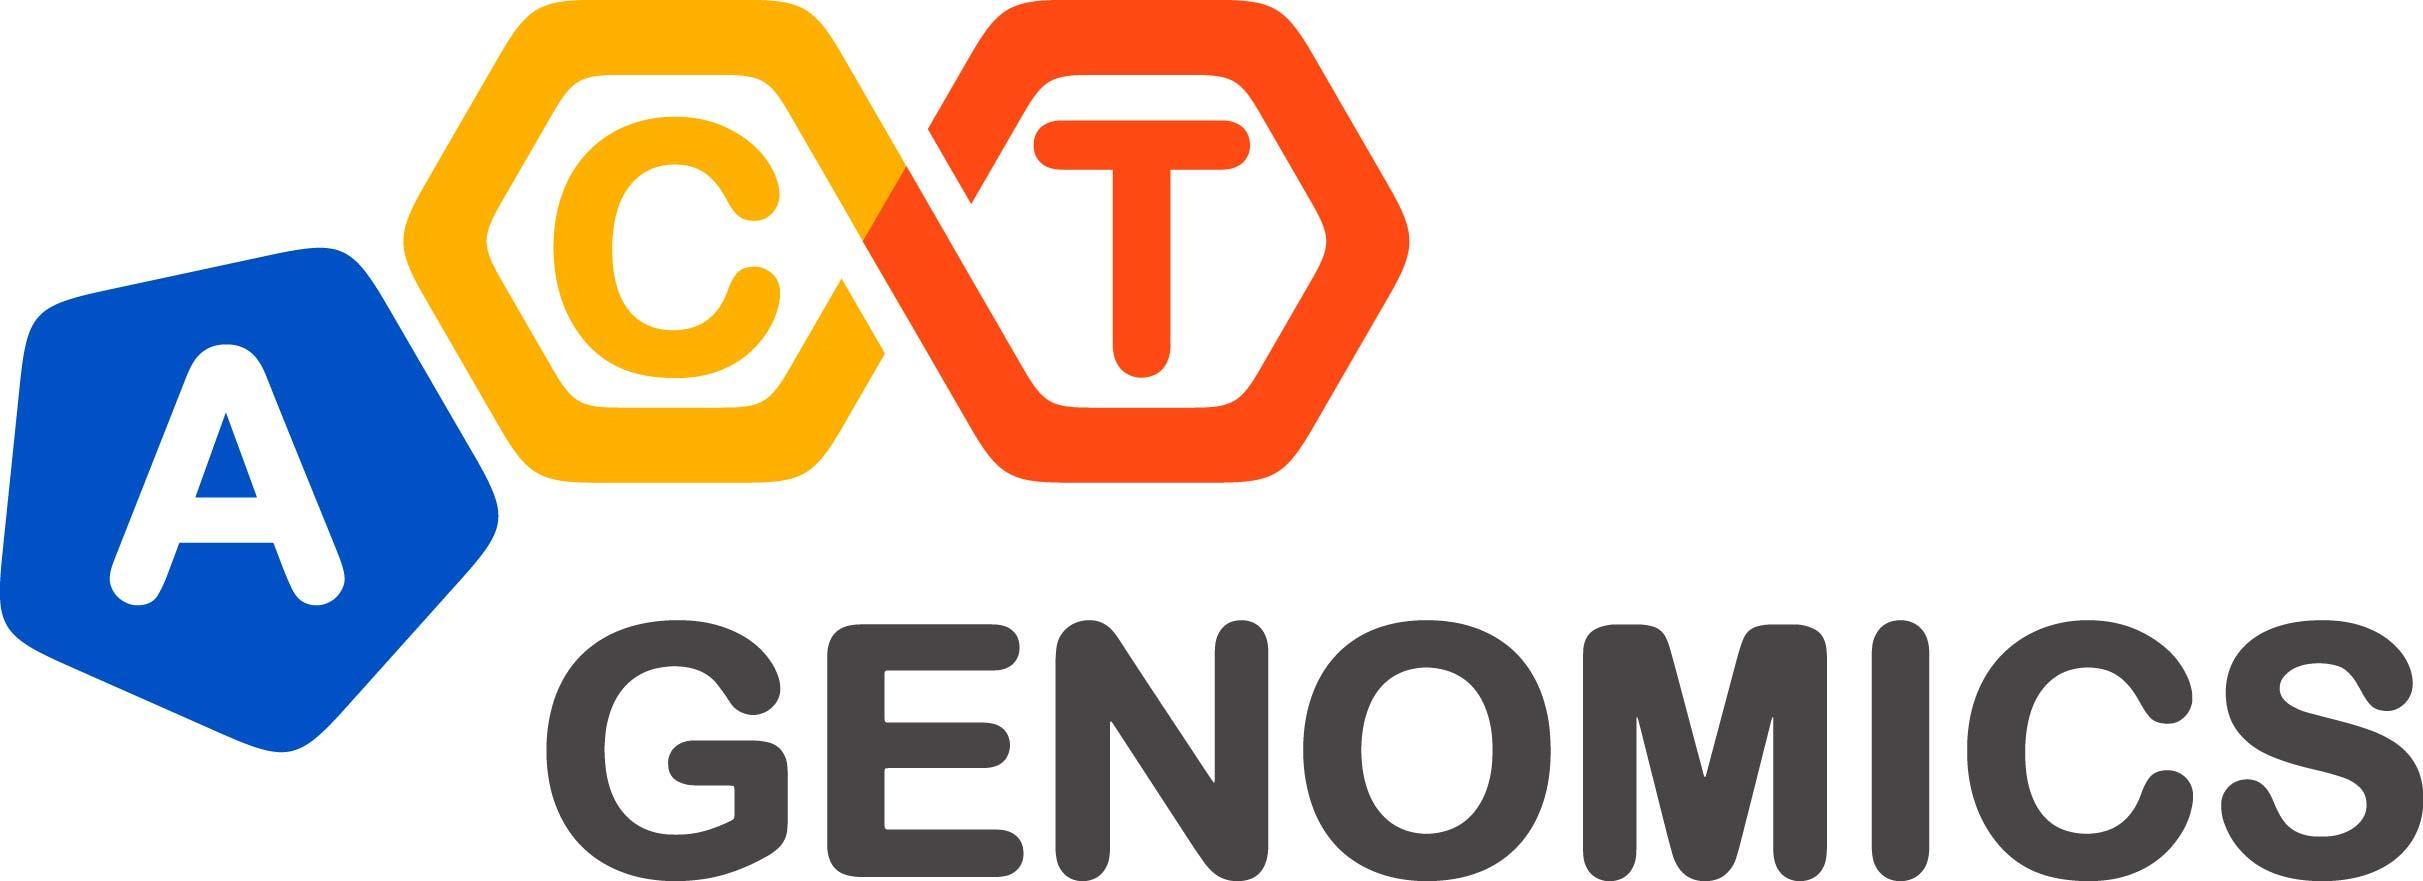 ACT Genomics Co., Ltd.